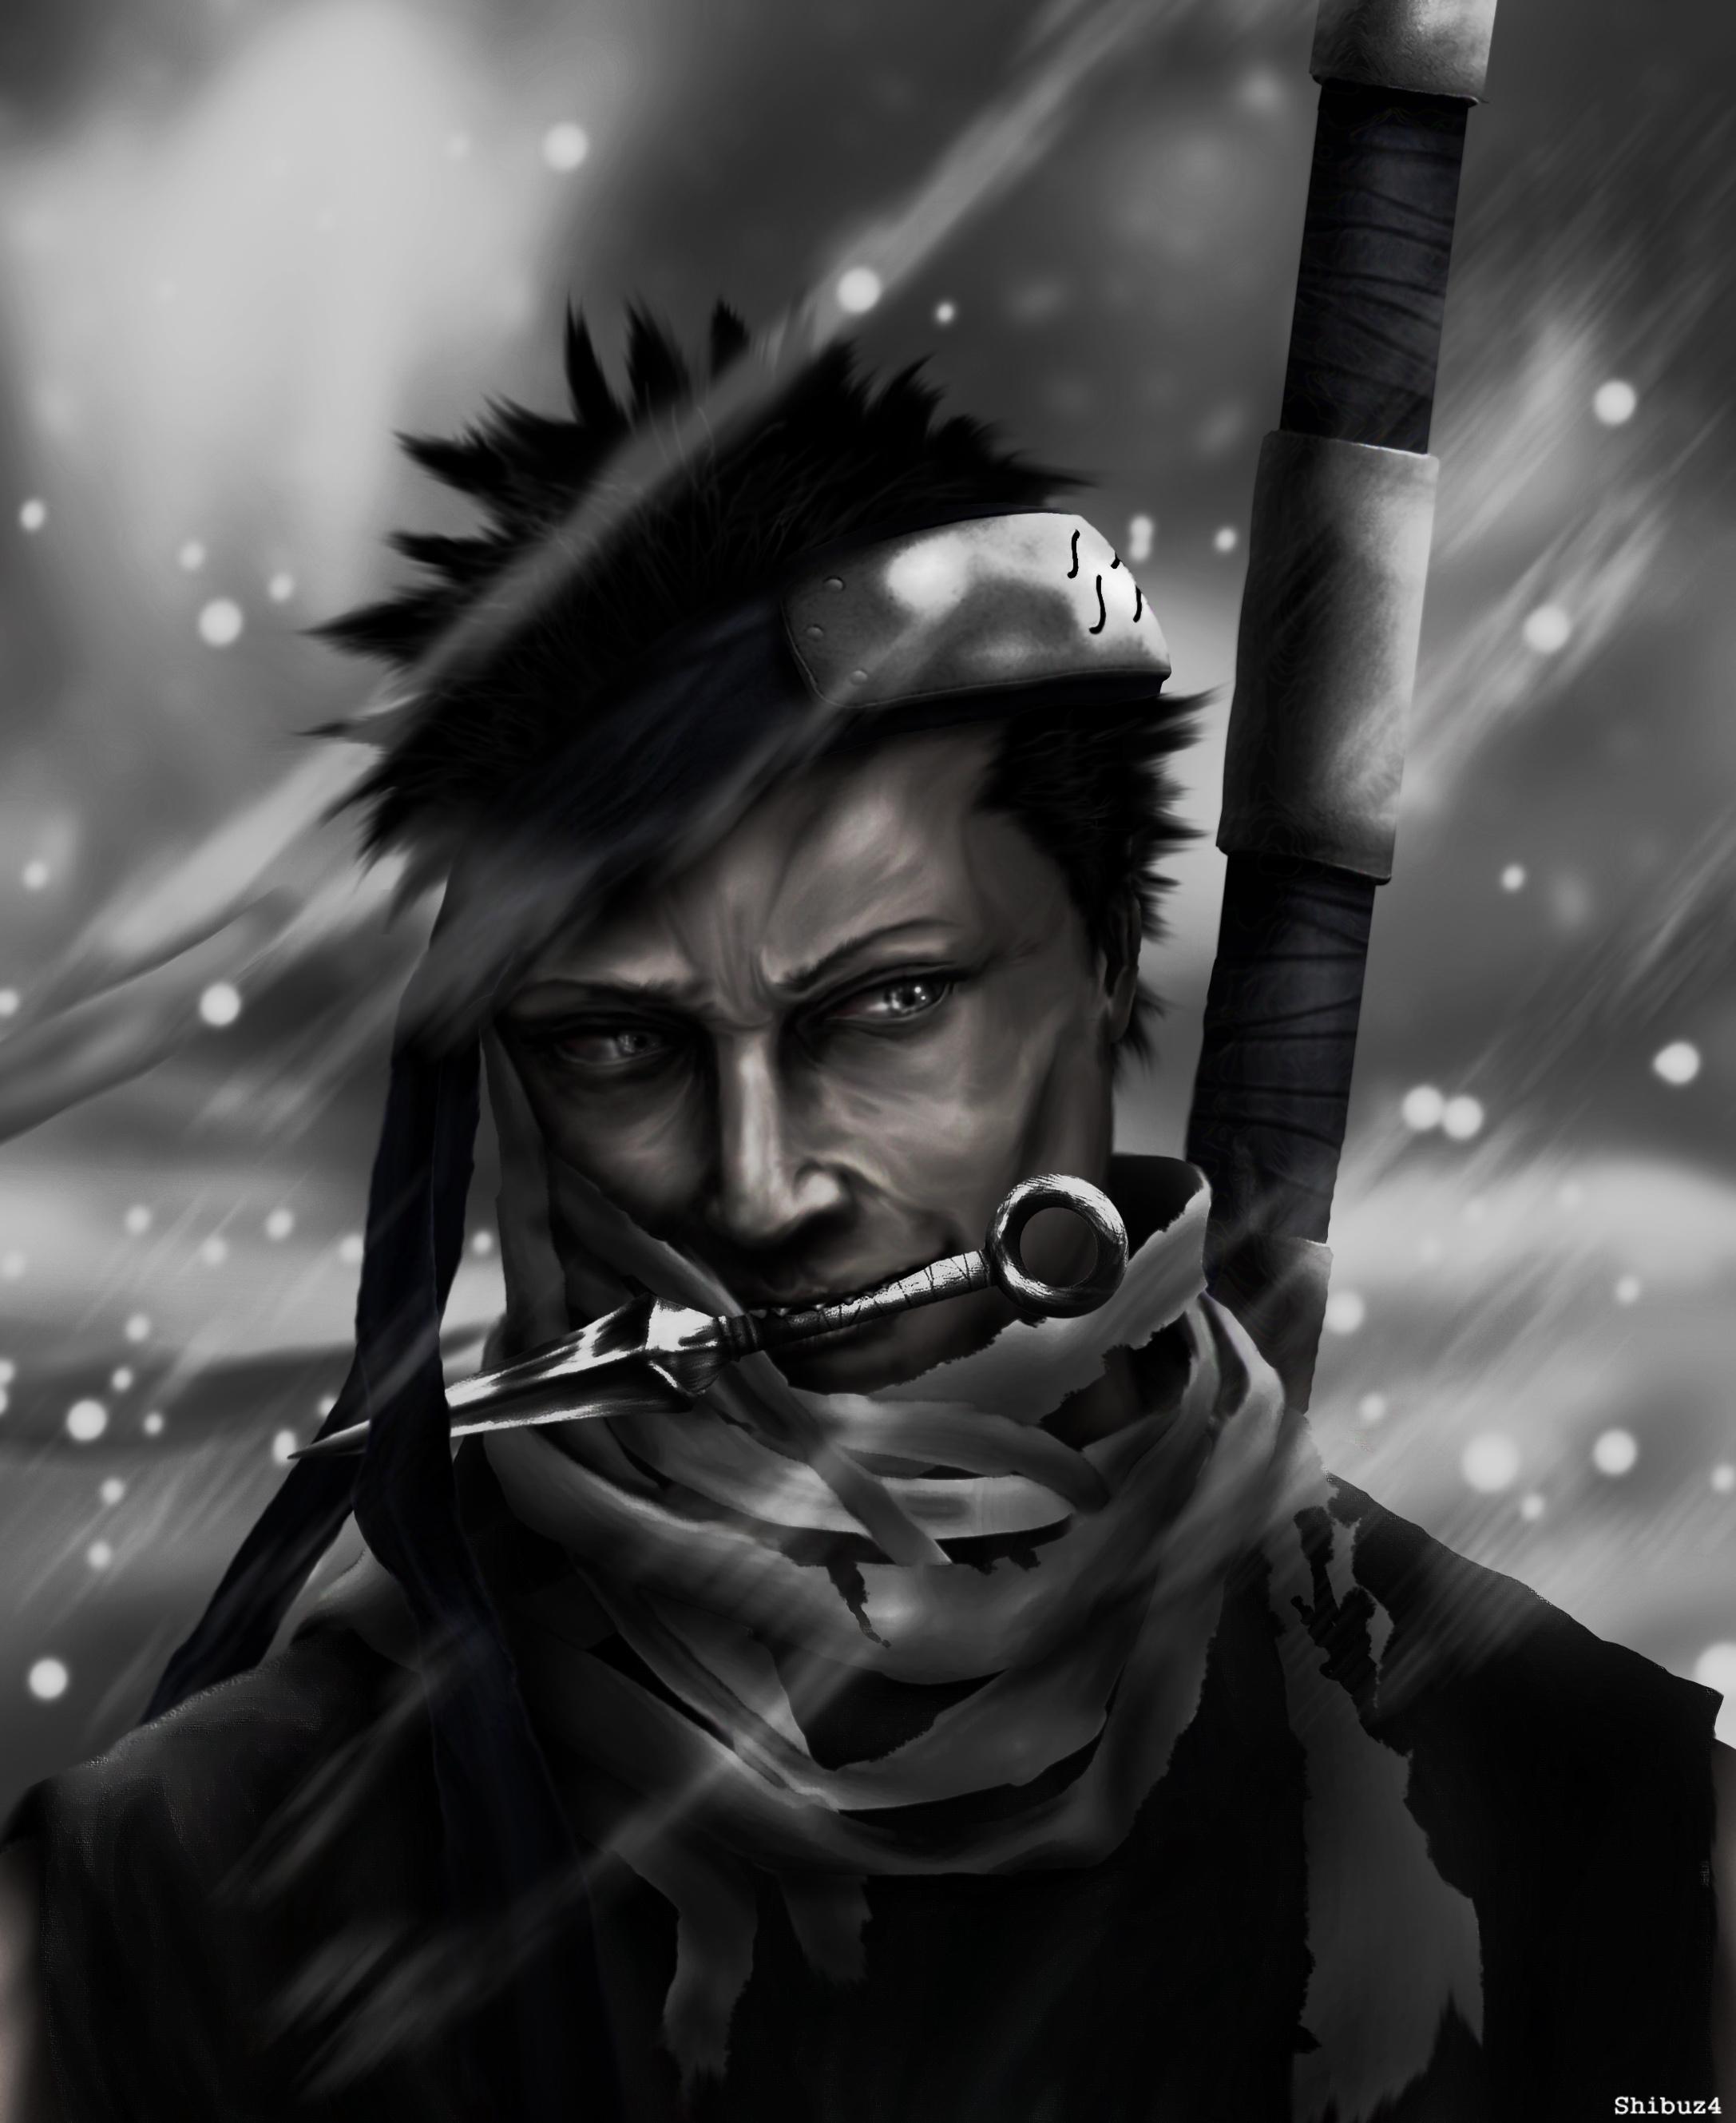 Sword Art Online Animated Wallpaper Demon Of The Mist Zabuza Momochi Daily Anime Art